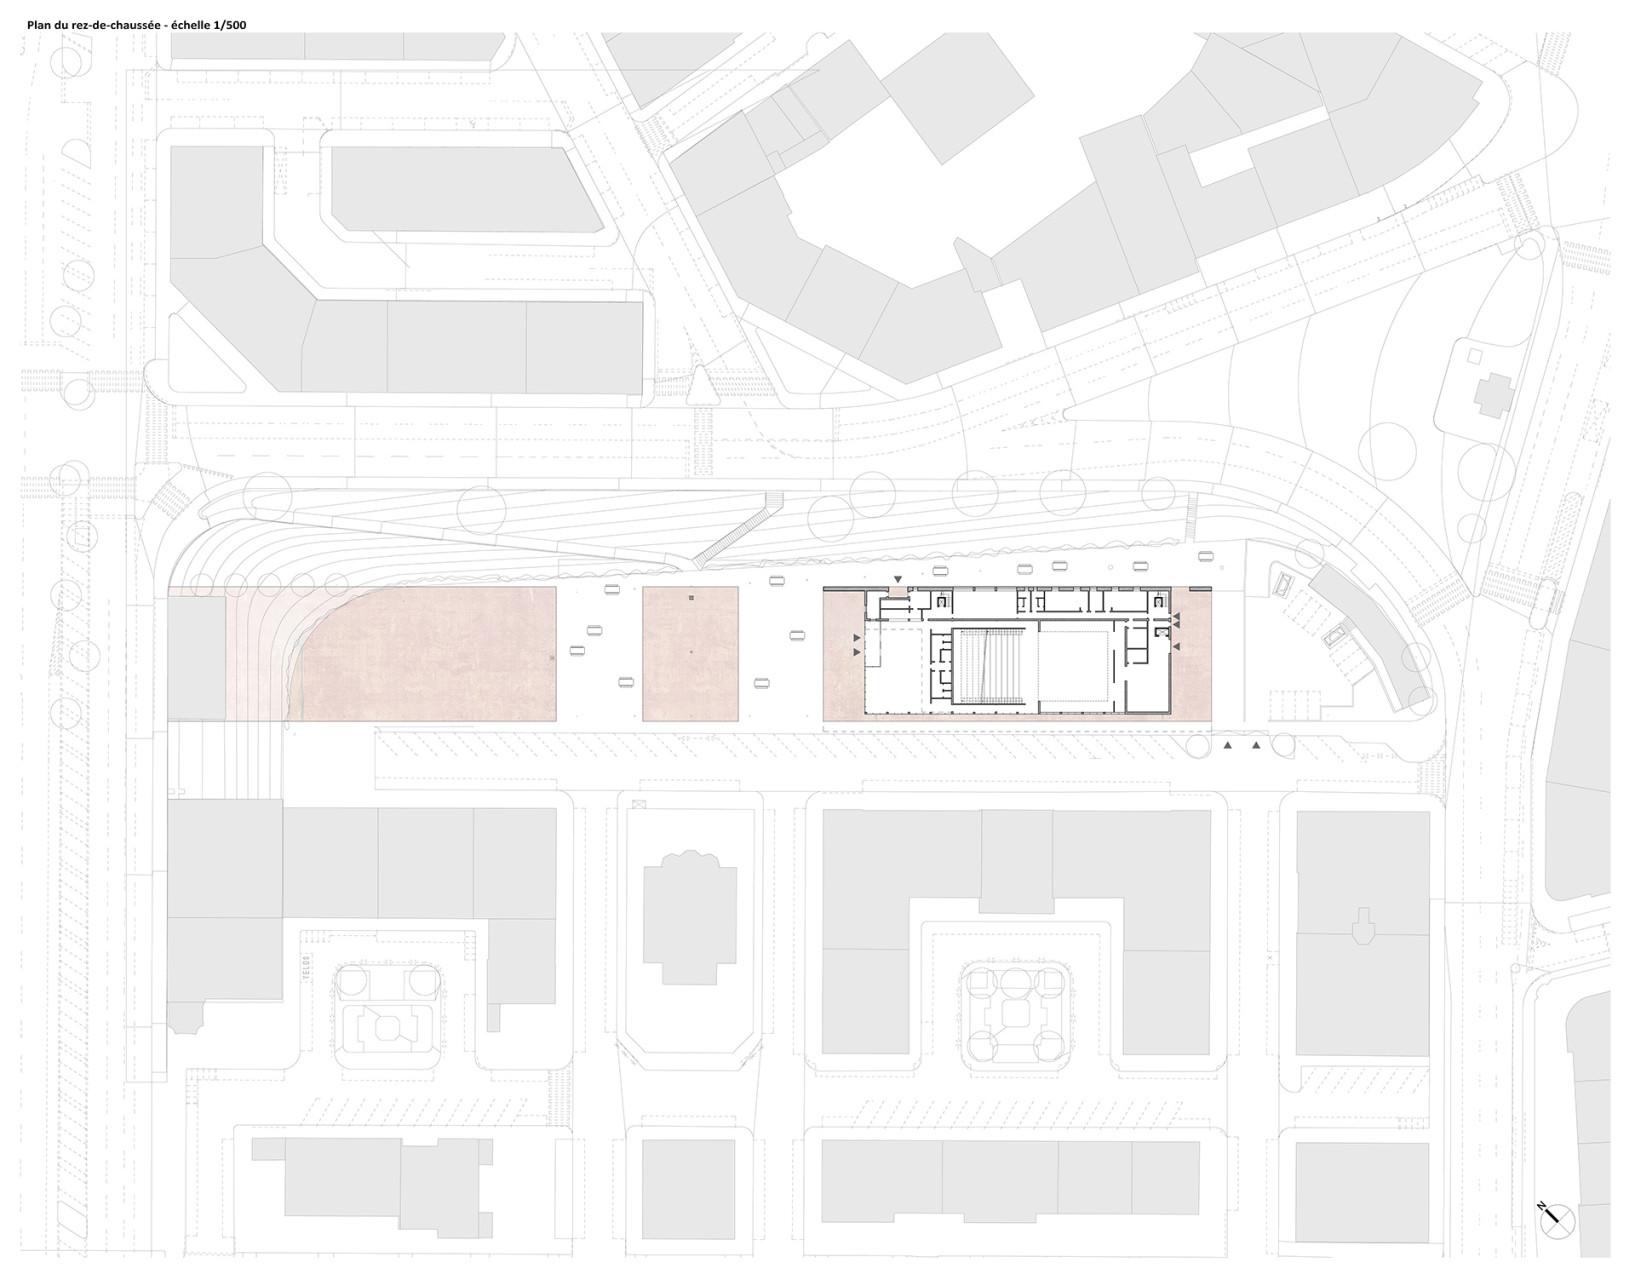 2 Wisp-Architects-Atelier-Arlanch-Pavillon-da-la-danse-Drawing